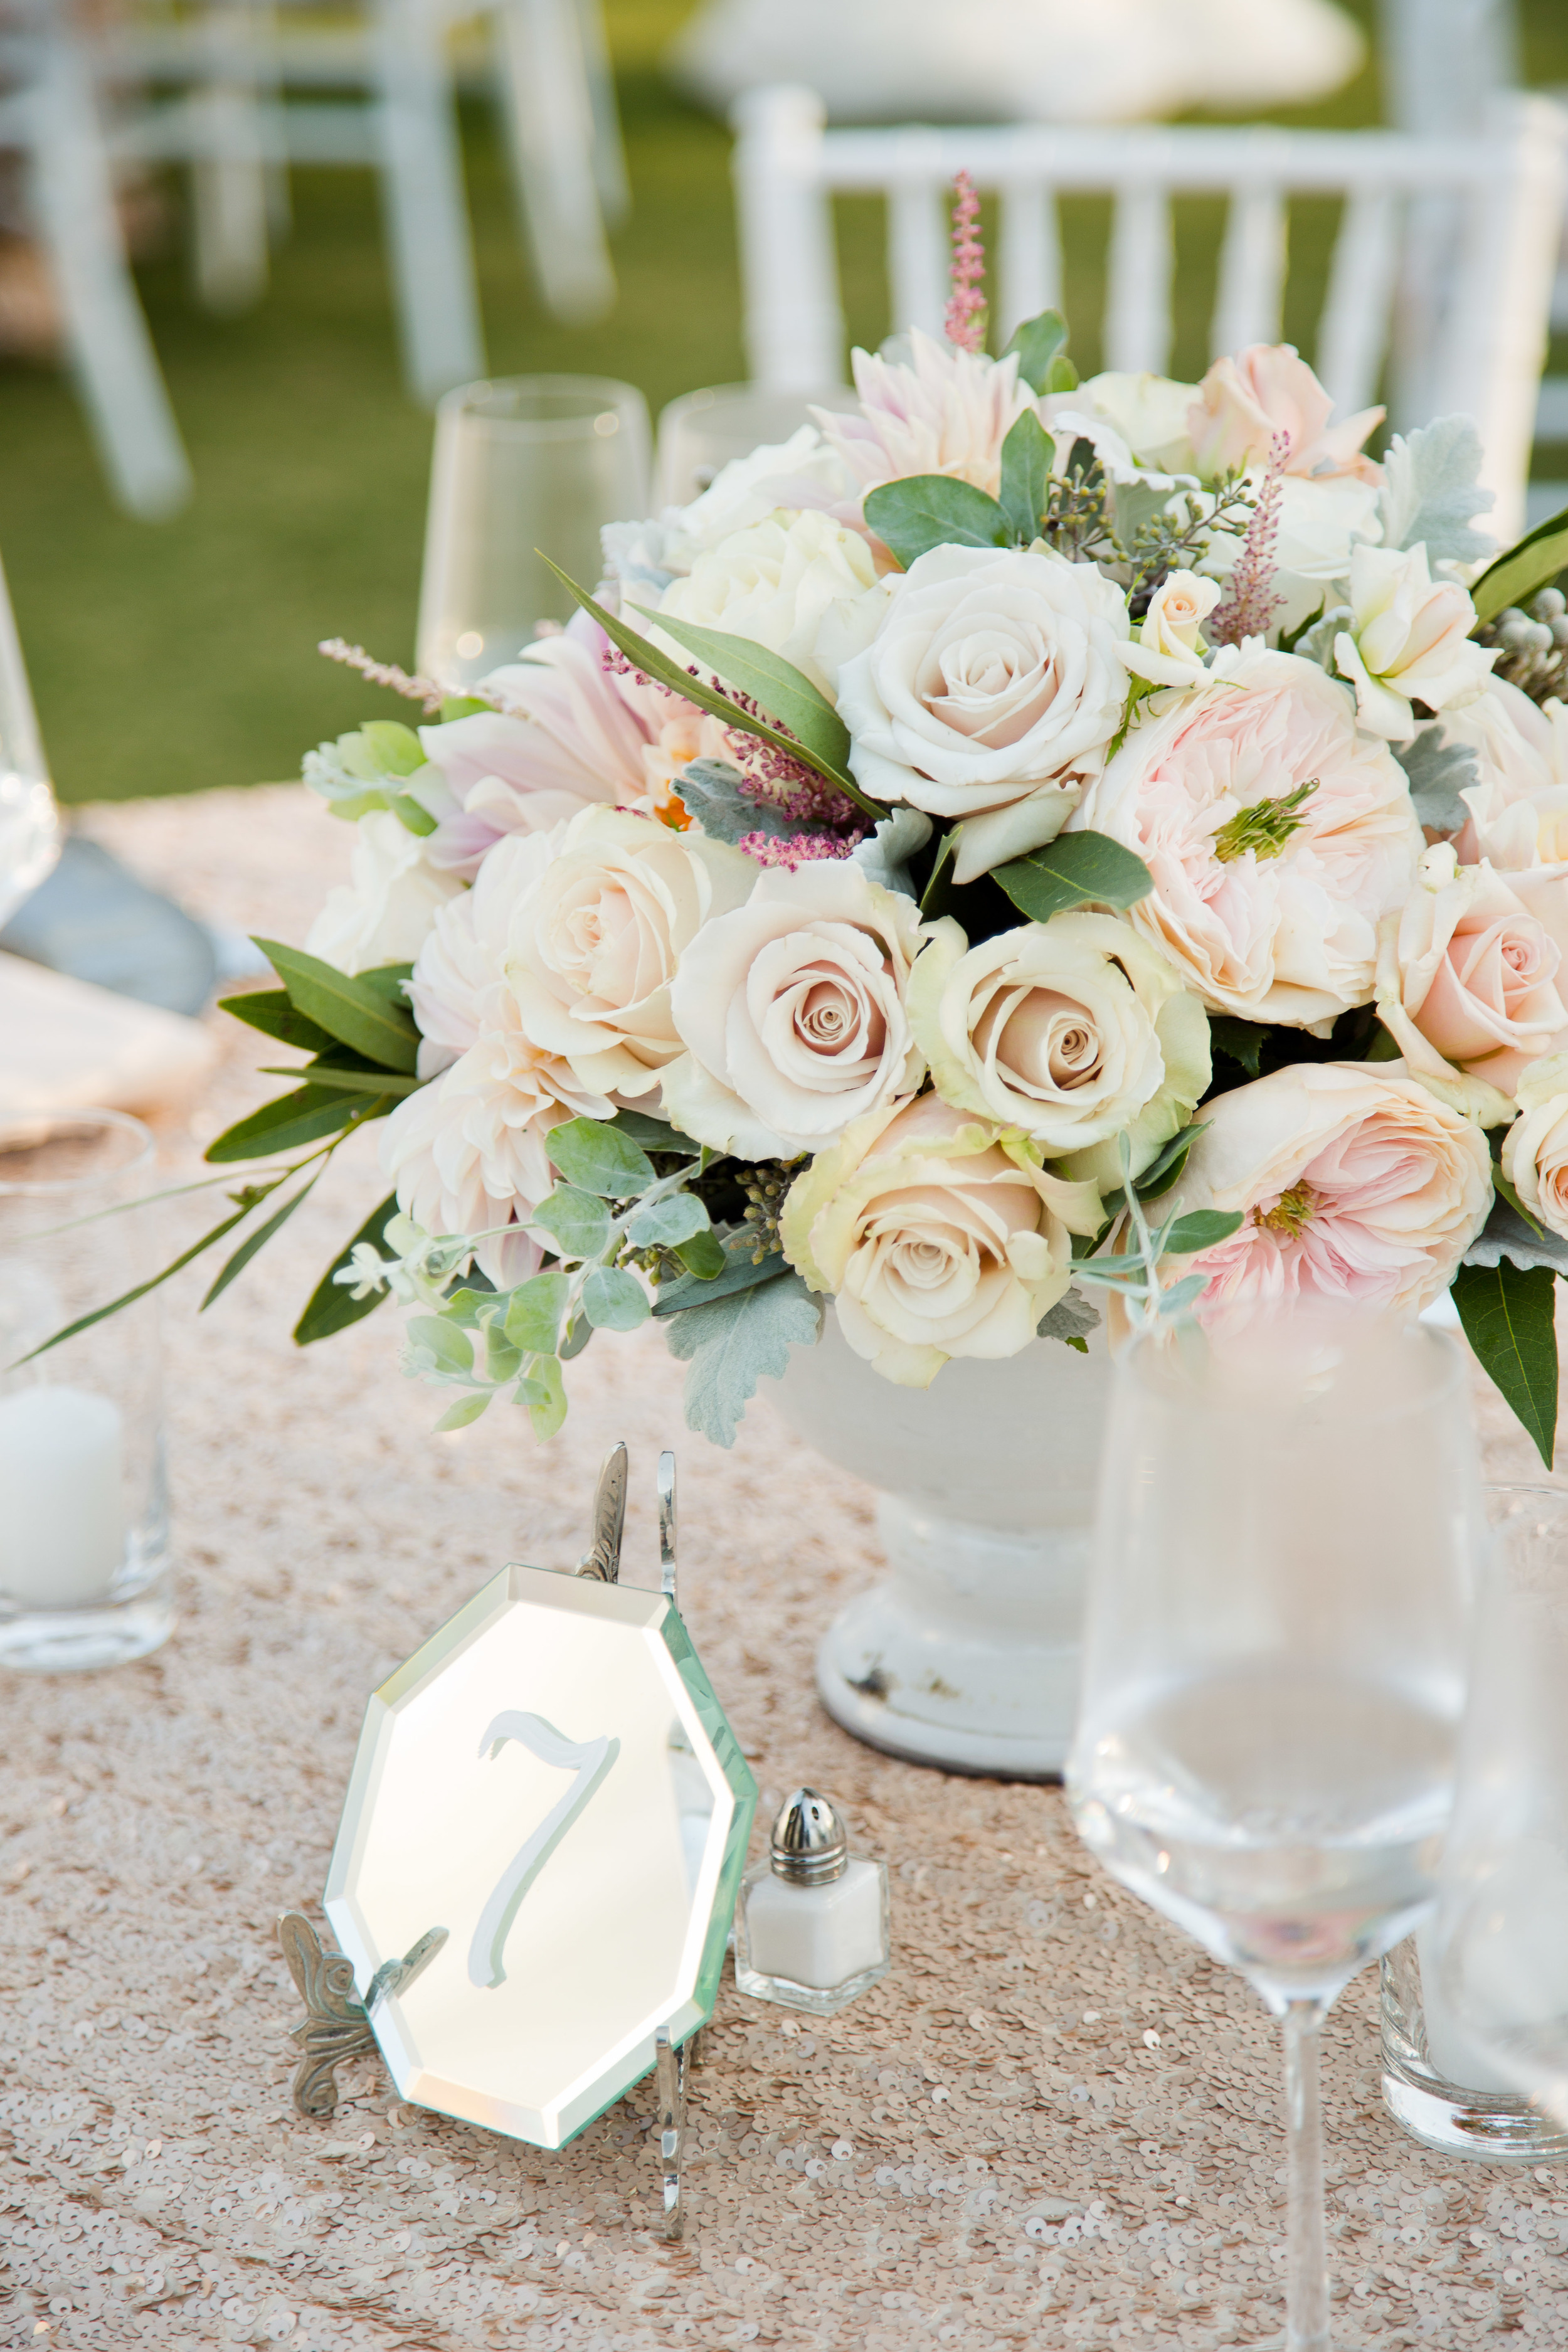 Ashleigh Taylor Photography | Cody Floral Design | Santa Barbara Wedding Florist